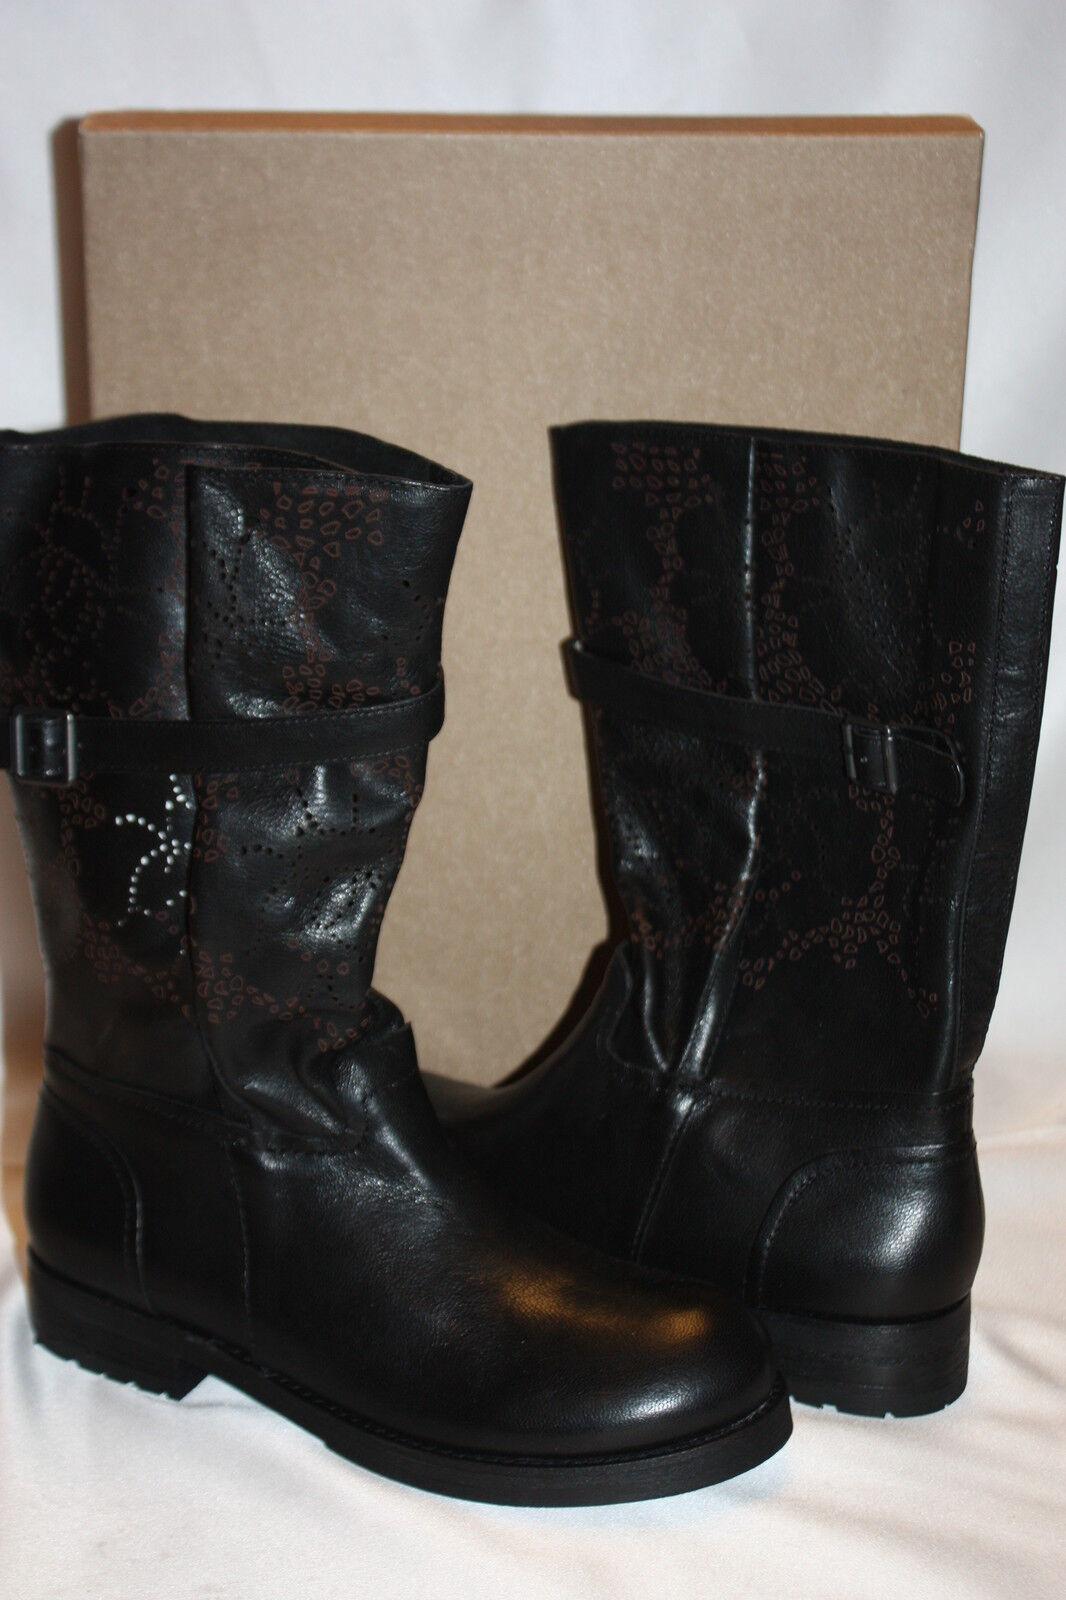 Nuevo  nuevo nuevo nuevo En Caja  Bacio 61 Negro Cuero Perforado botas Motocicleta de prolisso  260  mas barato